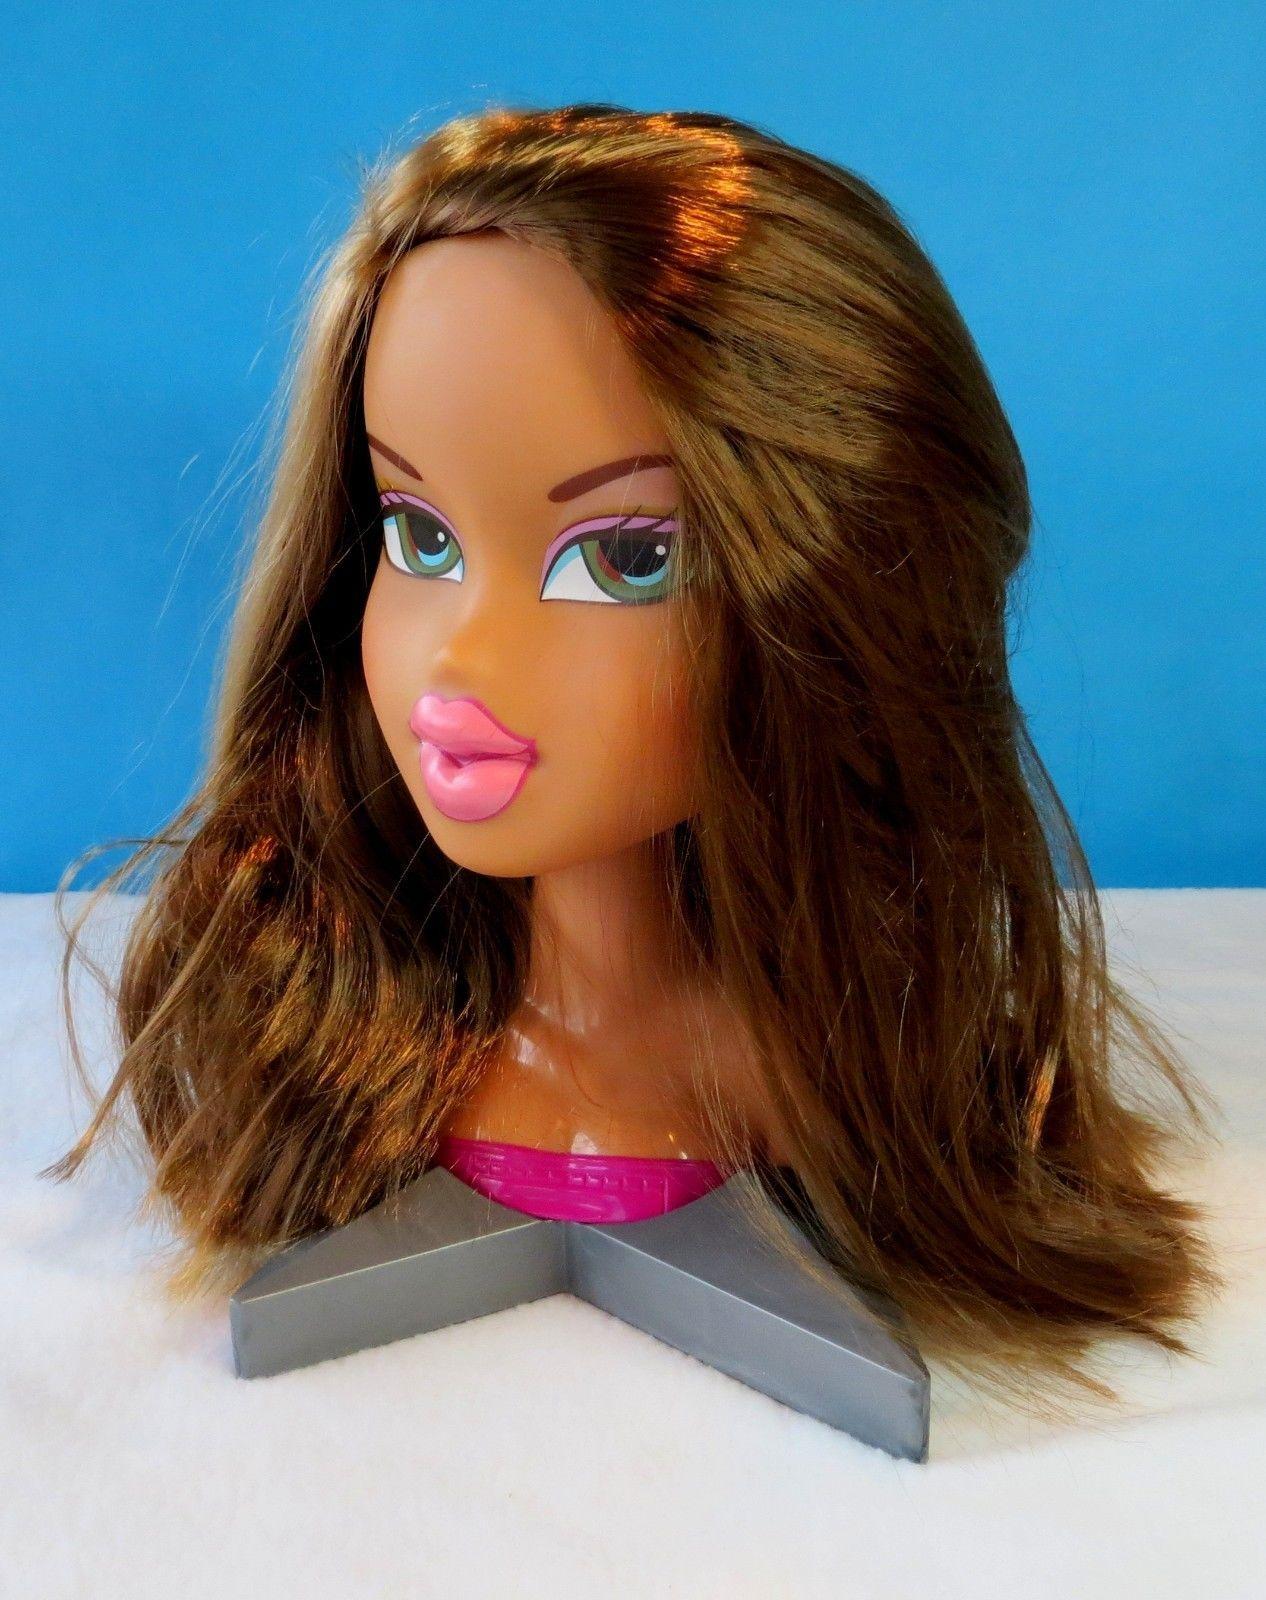 Super Rare 2002 Large Bratz Doll Moveable Styling Head Jasmin Super Cool Ebay Bratz Doll Style Makeover Dolls